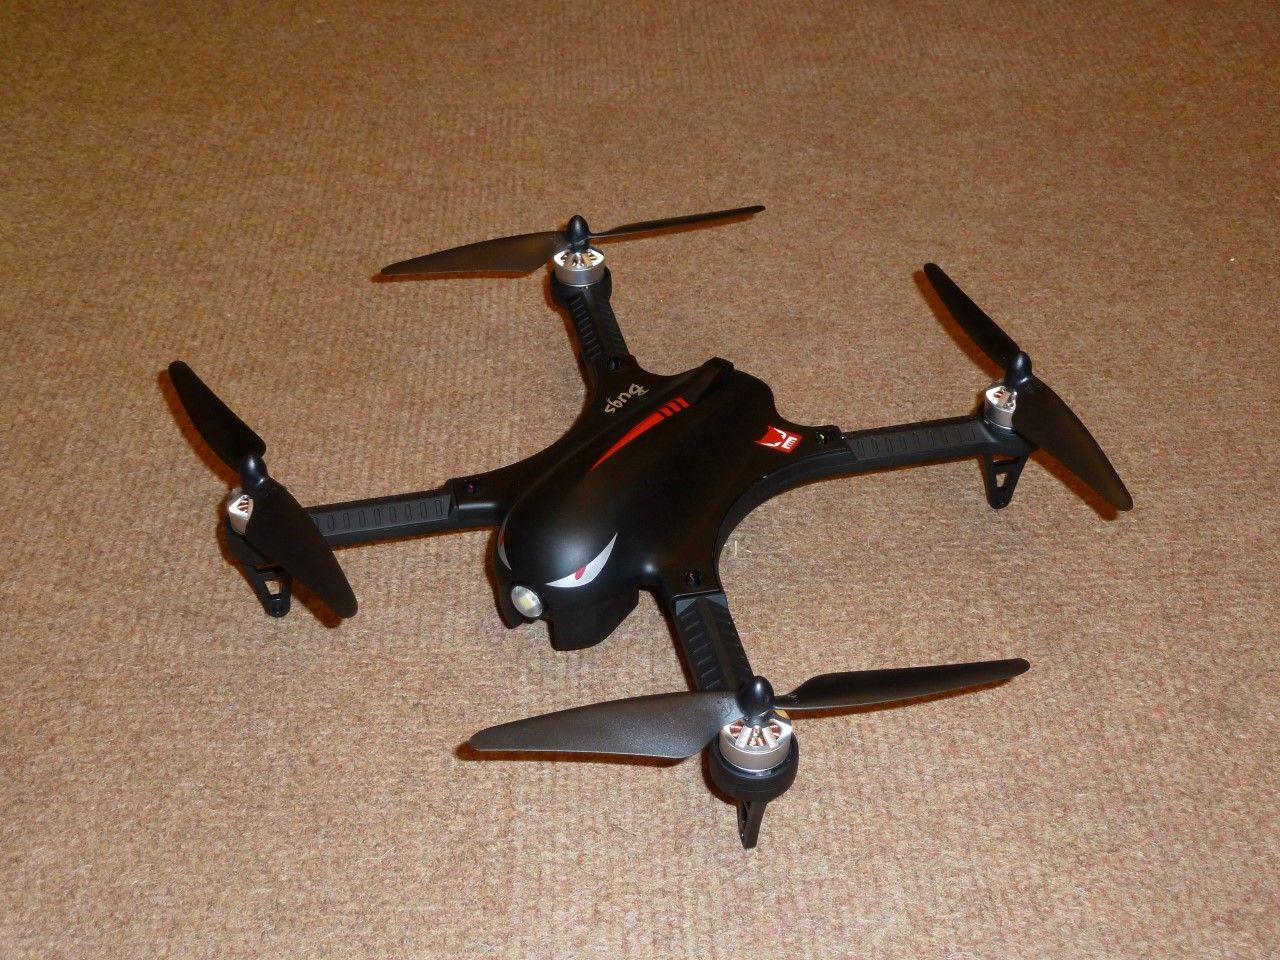 MJX B3 Bugs 3 brushless Fun / Racing Quadrocopter ohne Schnickschnack